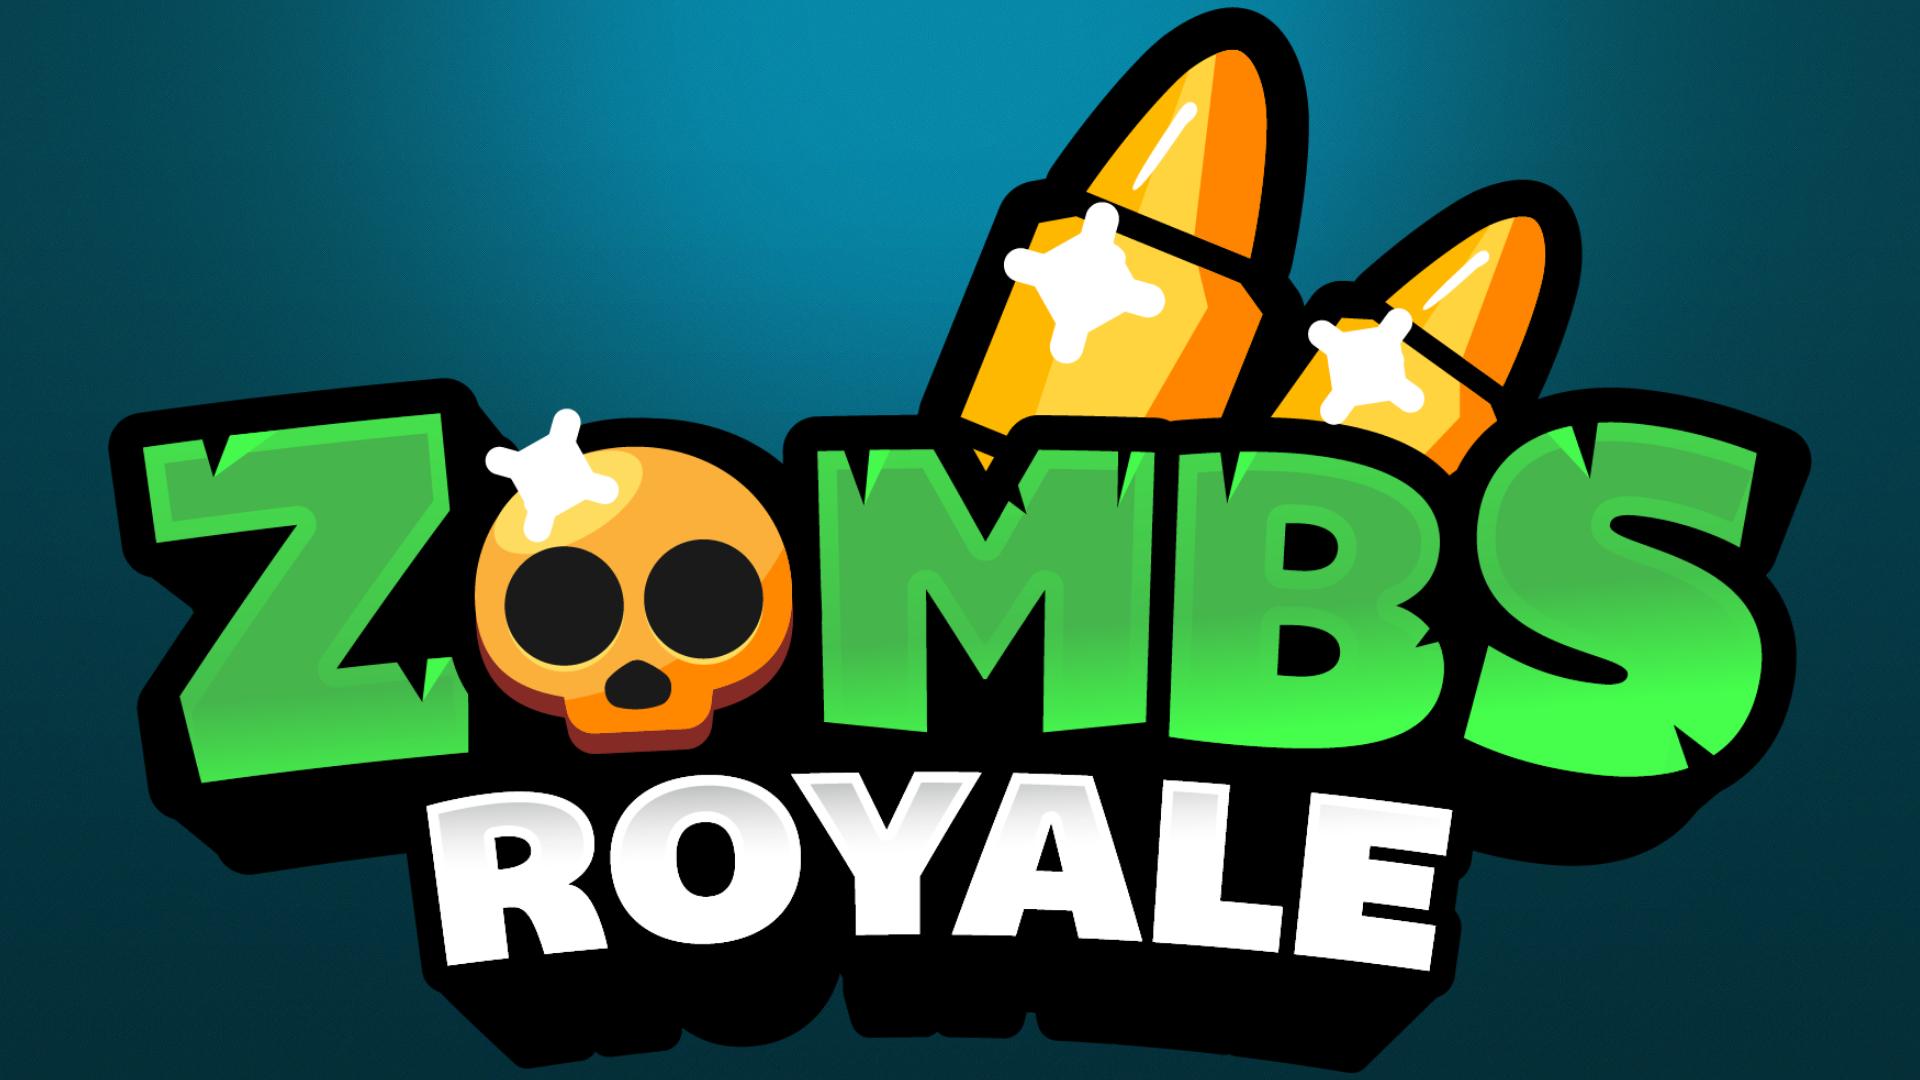 Zombs Royale